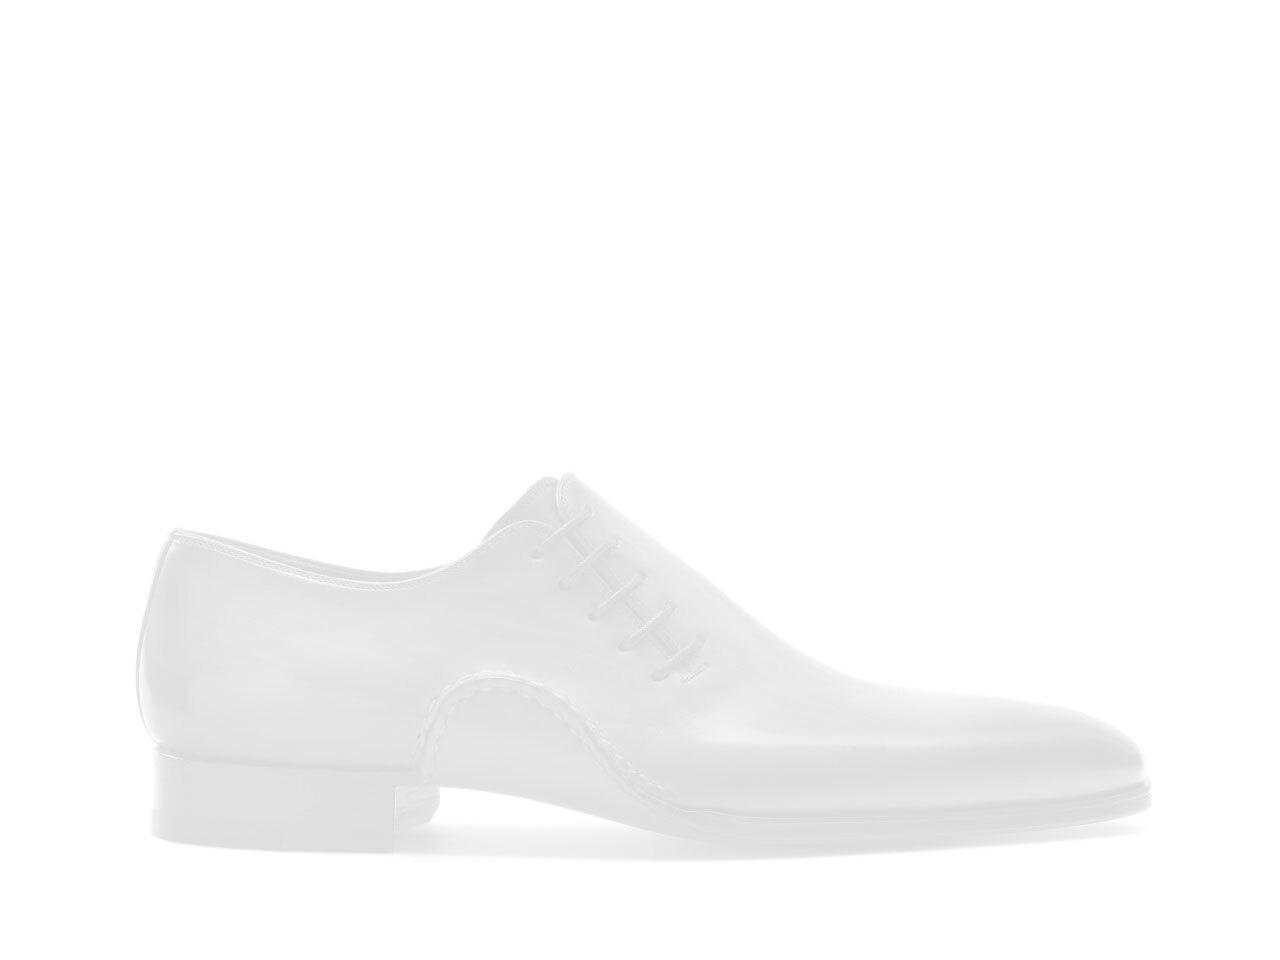 Pair of the Magnanni Nalda Cuero Men's High Top Sneakers